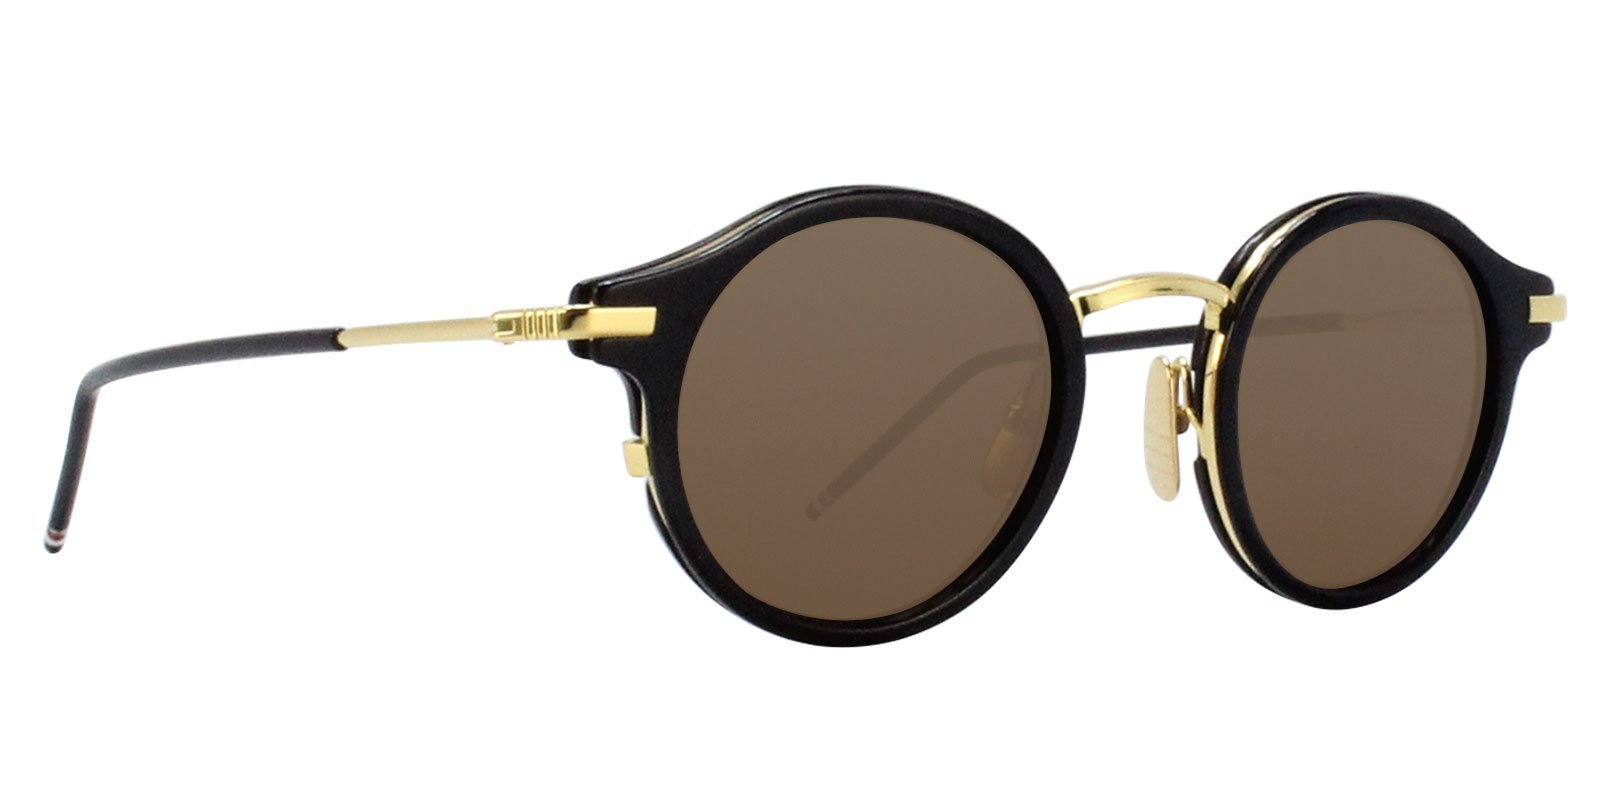 ddc7d7d578b thom-browne-sunglasses-thom-browne-tb-807-navy-dark-brown -designer-eyes-814981026528-2